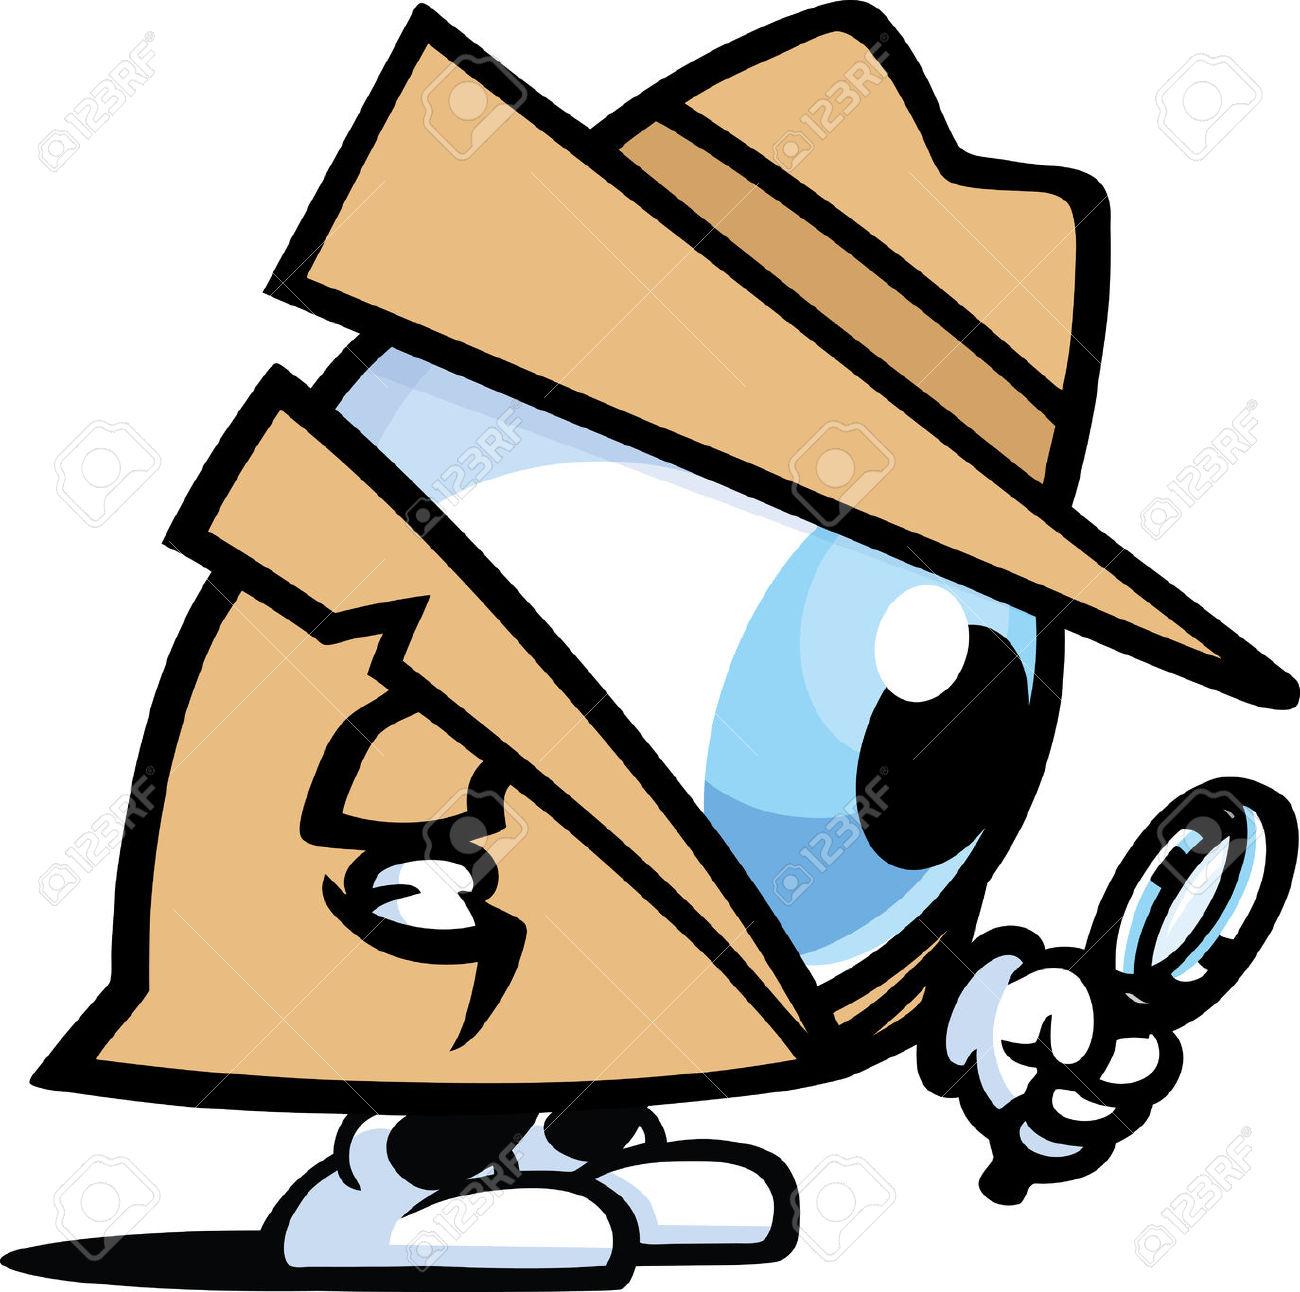 Eye spy clipart.